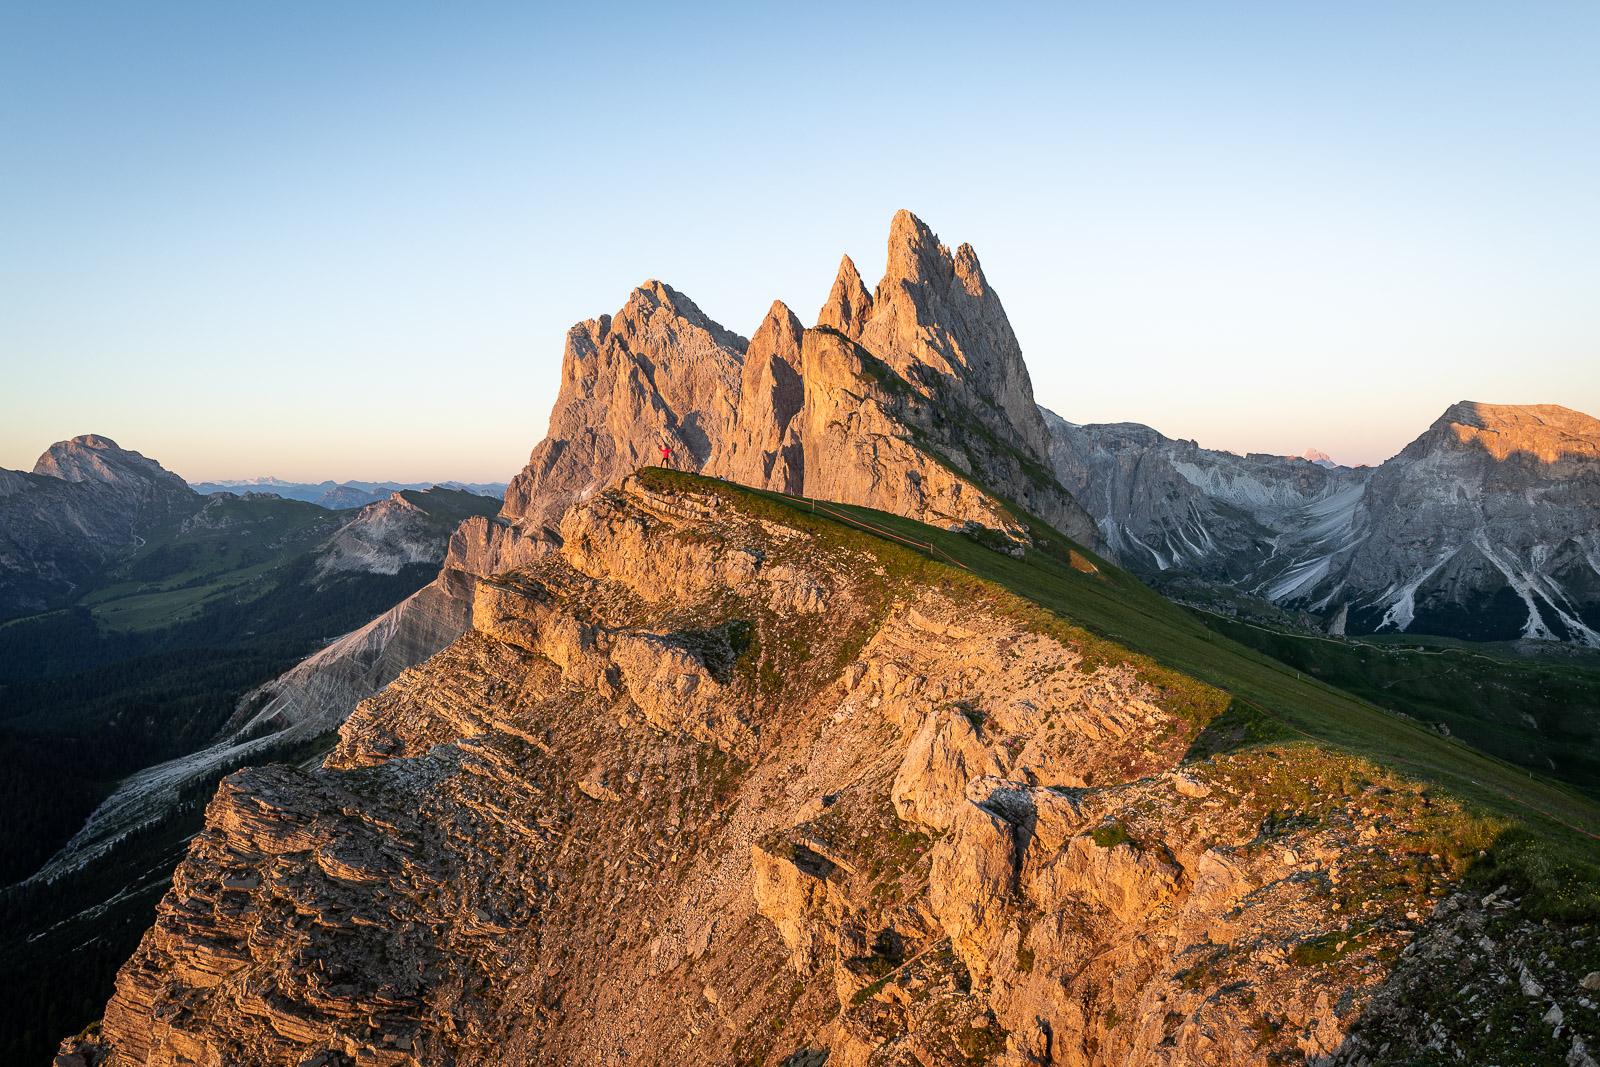 Seceda Bergkette in den Dolomiten (Italien) - Stefan Schäfer Landschaftsfotograf